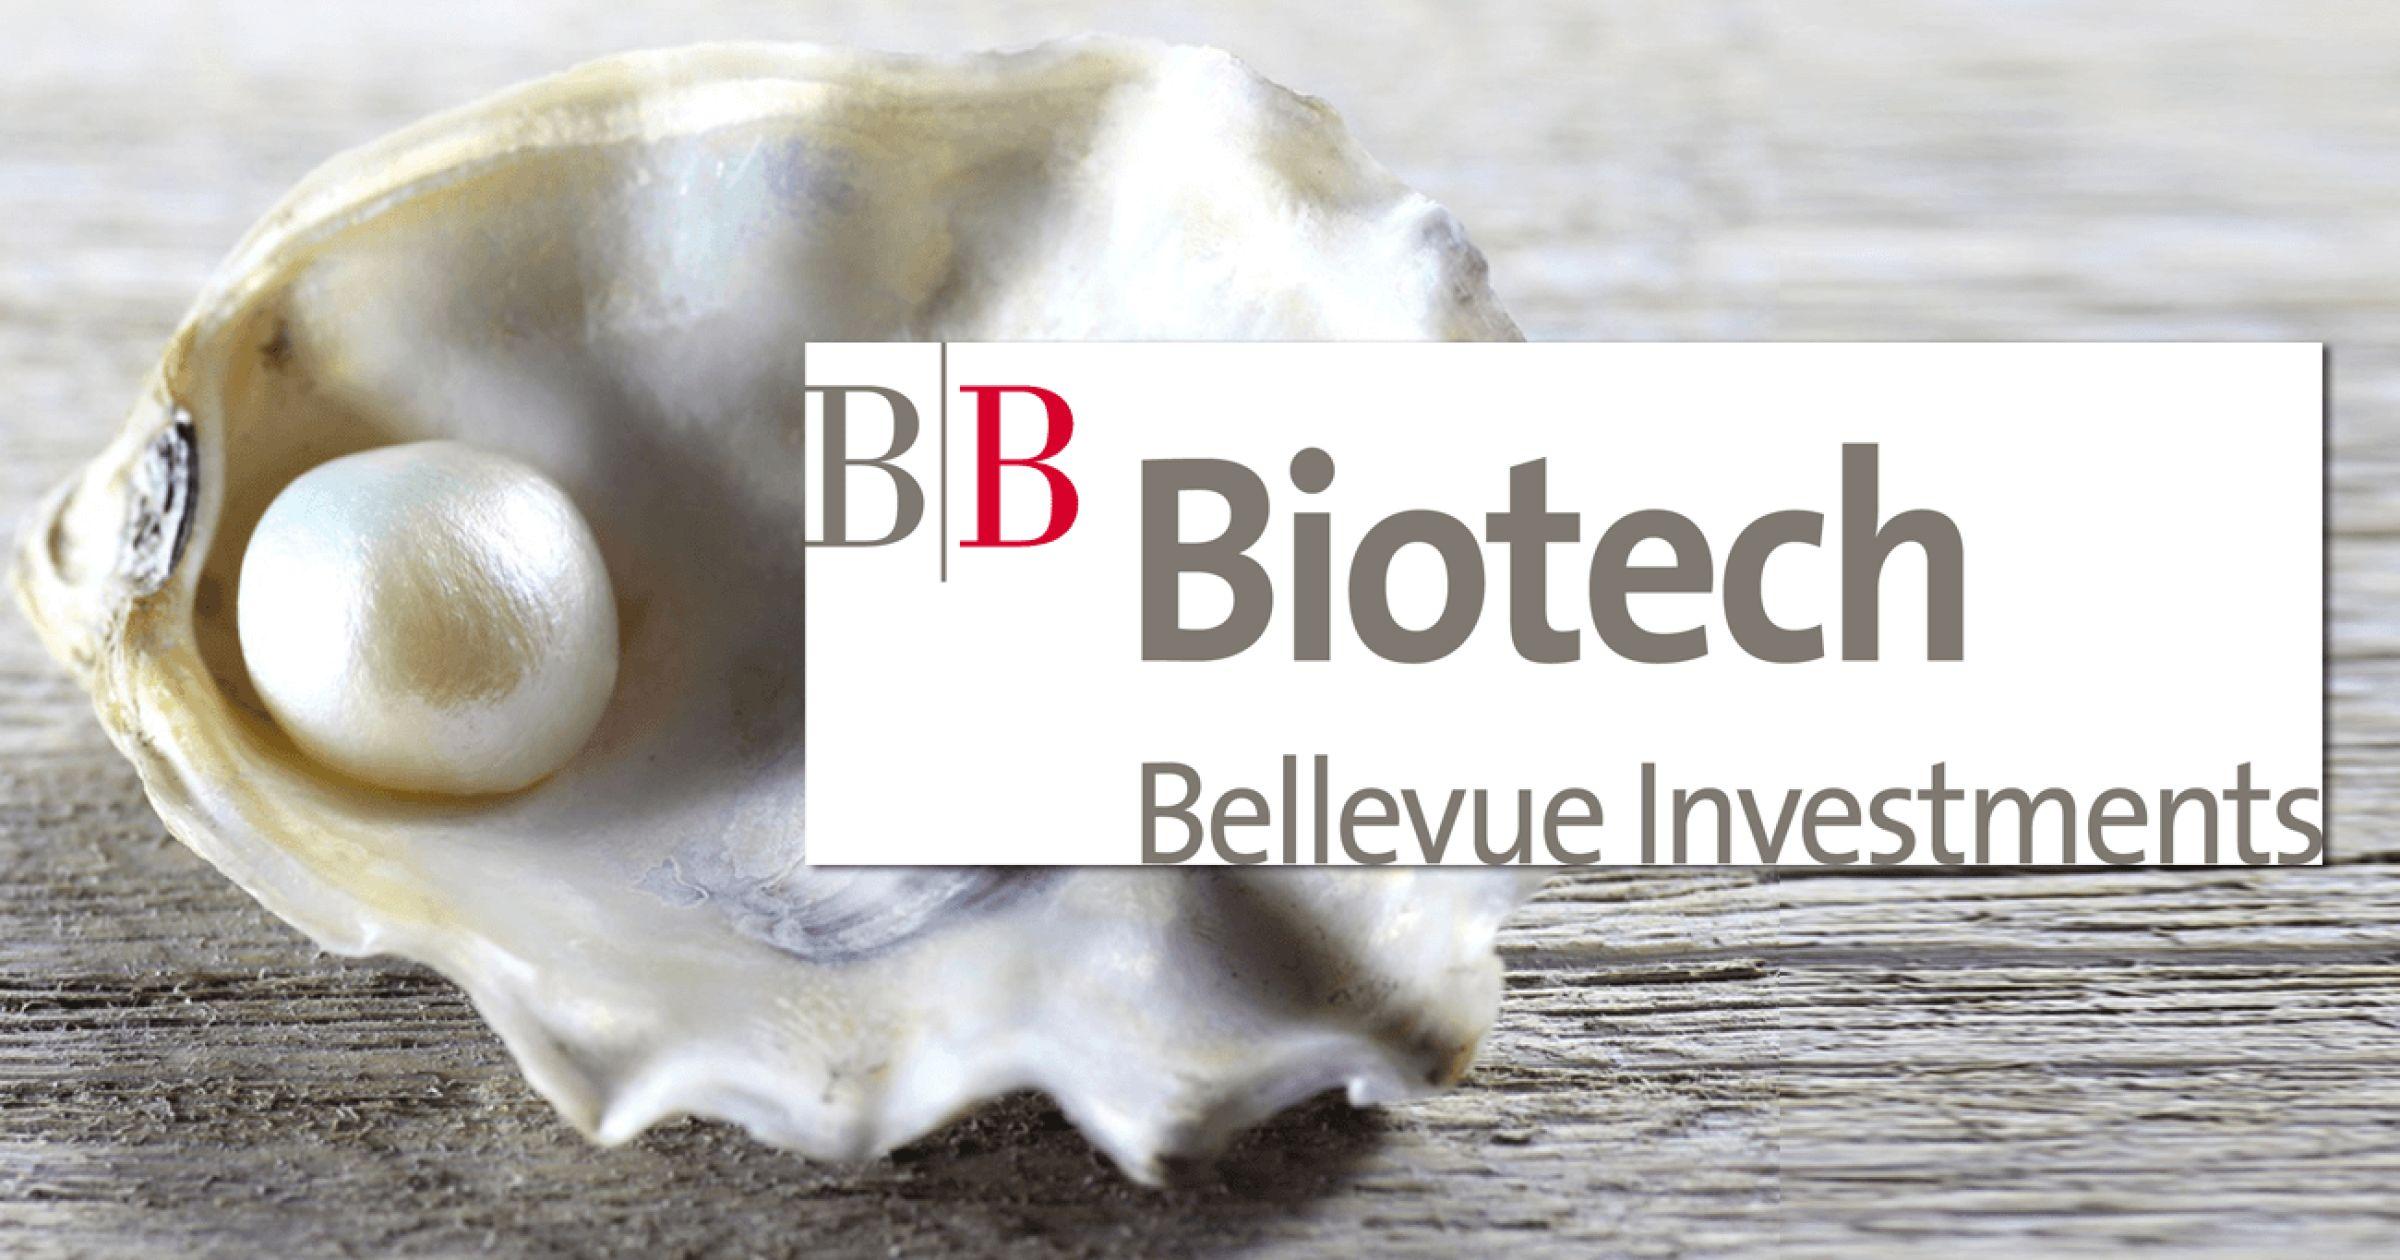 Dividende Bb Biotech